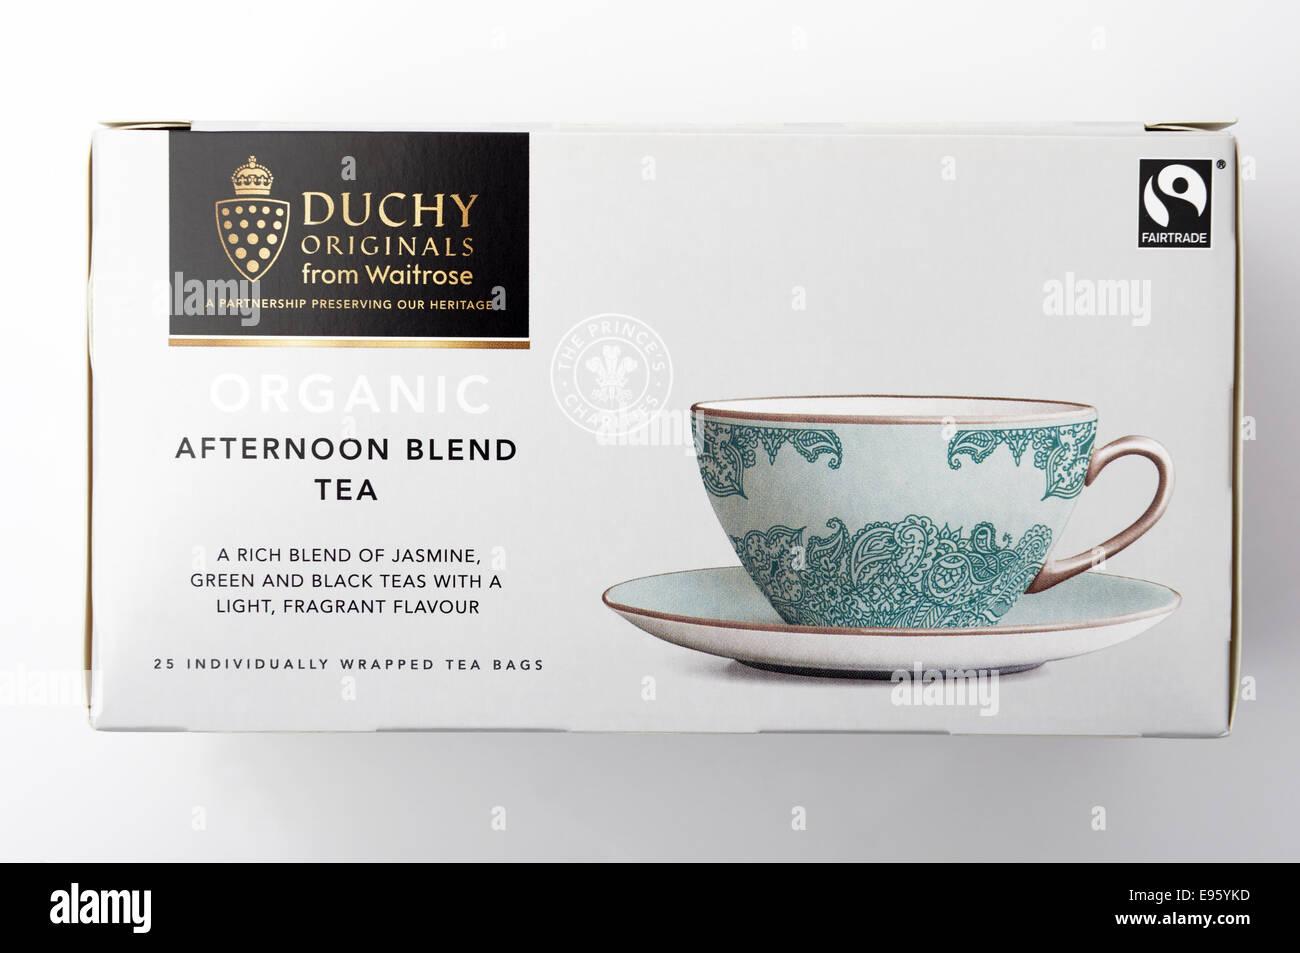 Waitrose Duchy Originals Afternoon tea Stock Photo